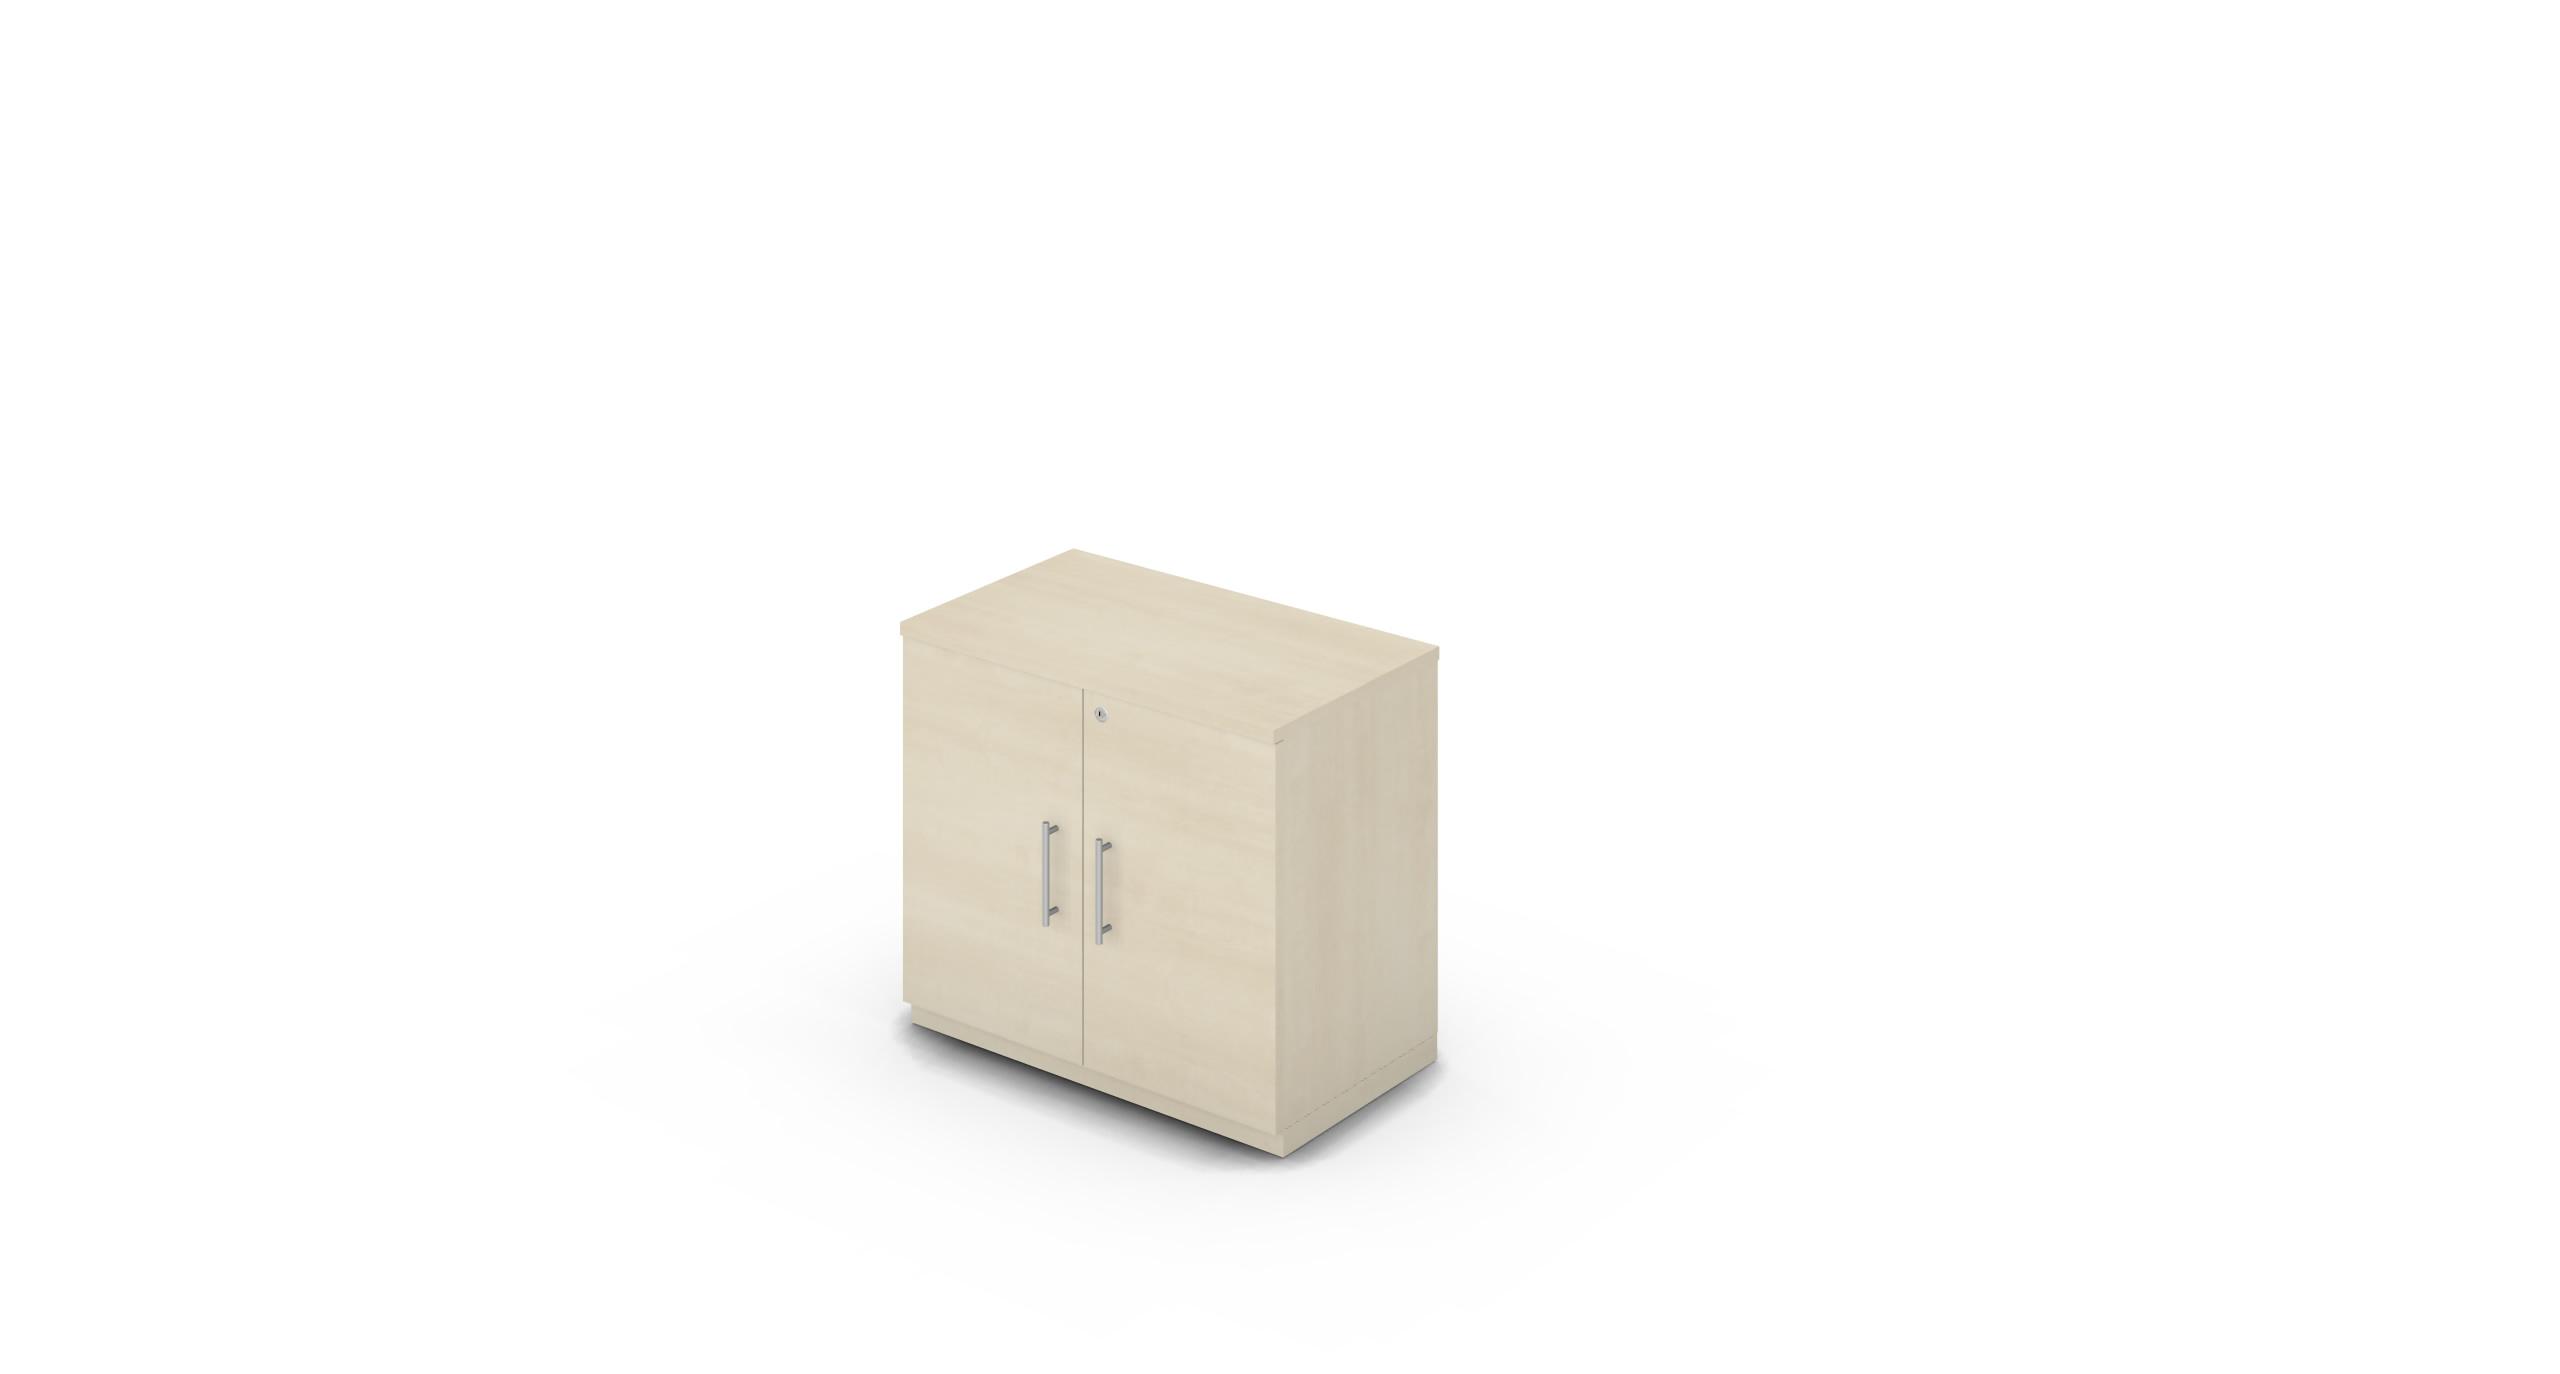 Cabinet_800x450x775_HD_Maple_Bar_Round_WithCylinder